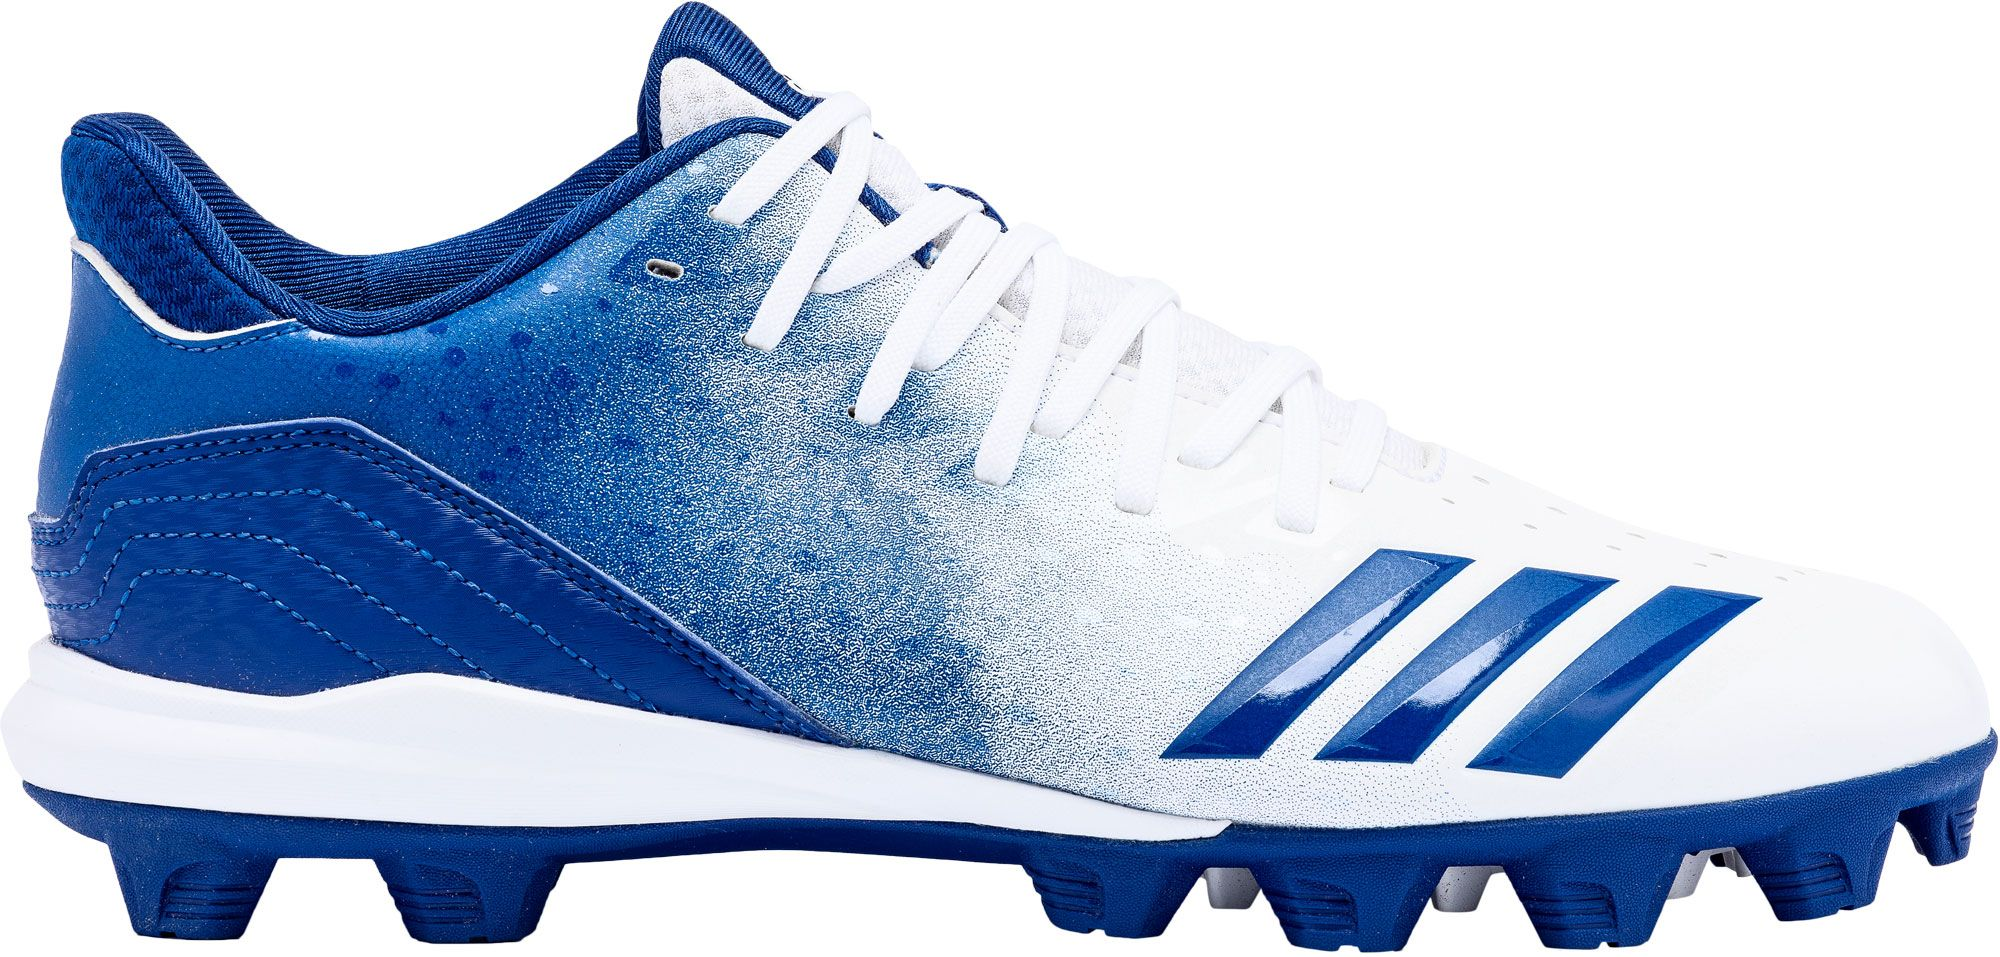 adidas baseball cleats 2019